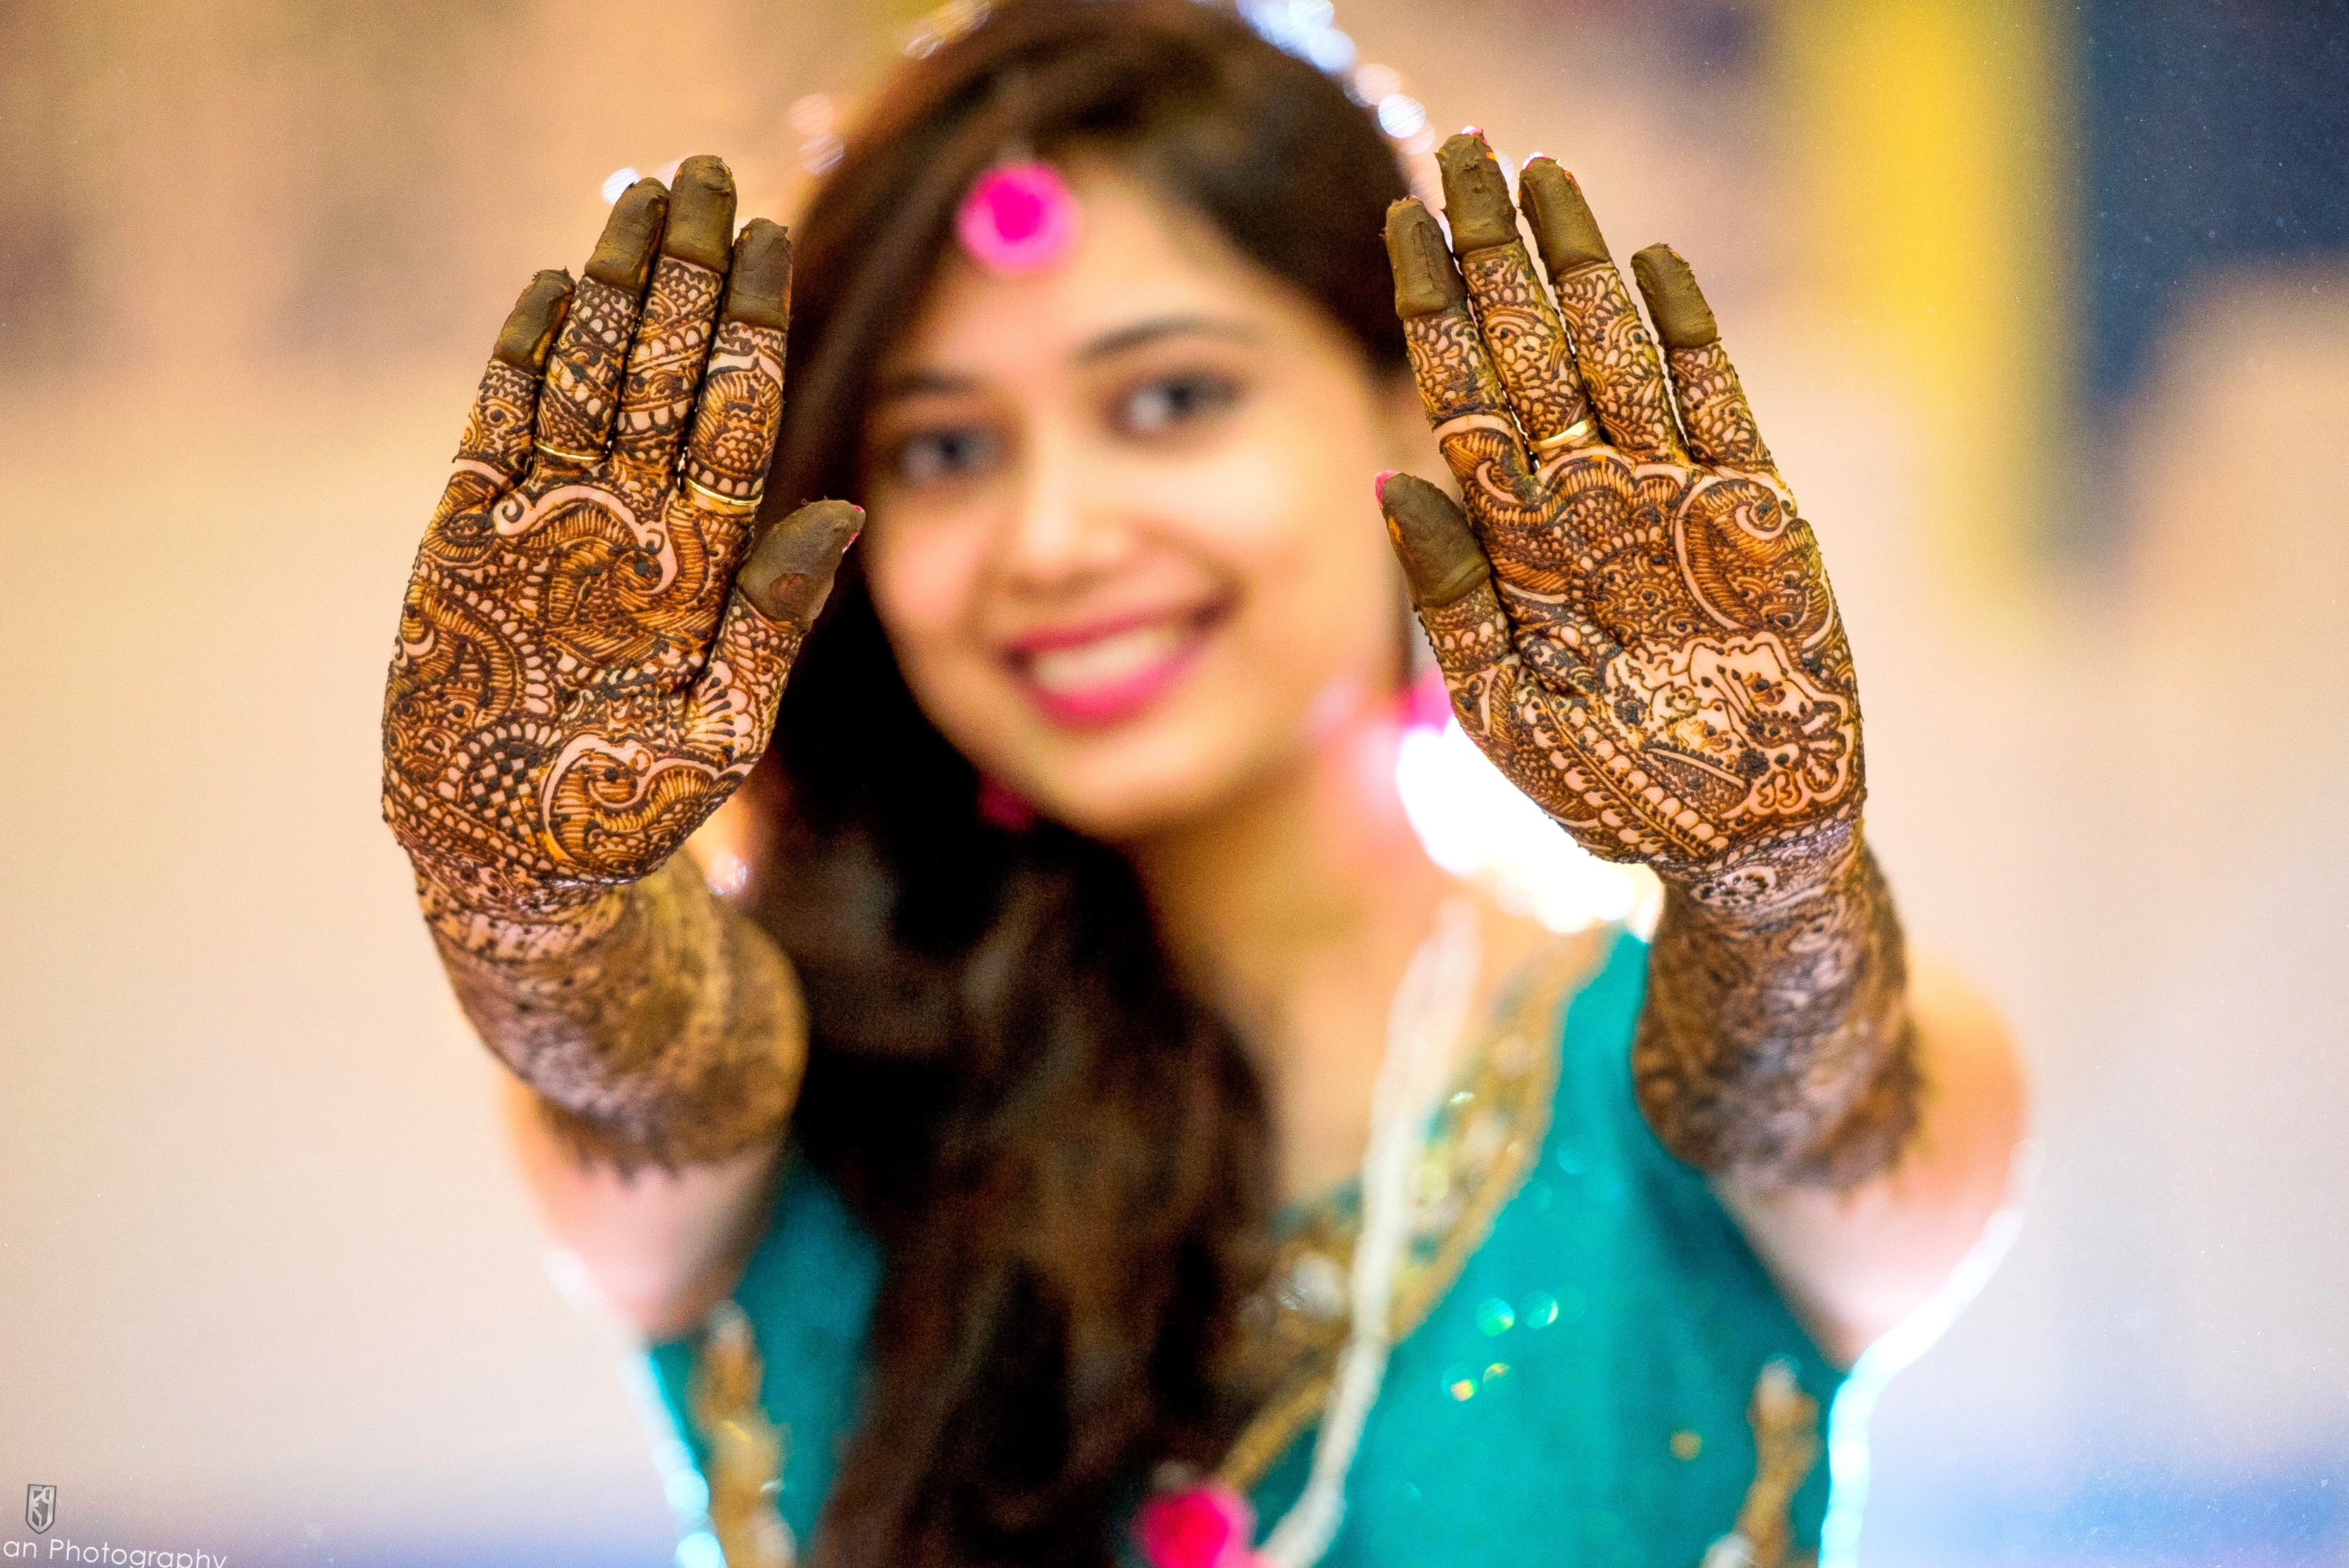 TOP 10 INTRICATE TRADITIONAL INDIAN BRIDAL HENNA MEHNDI ...